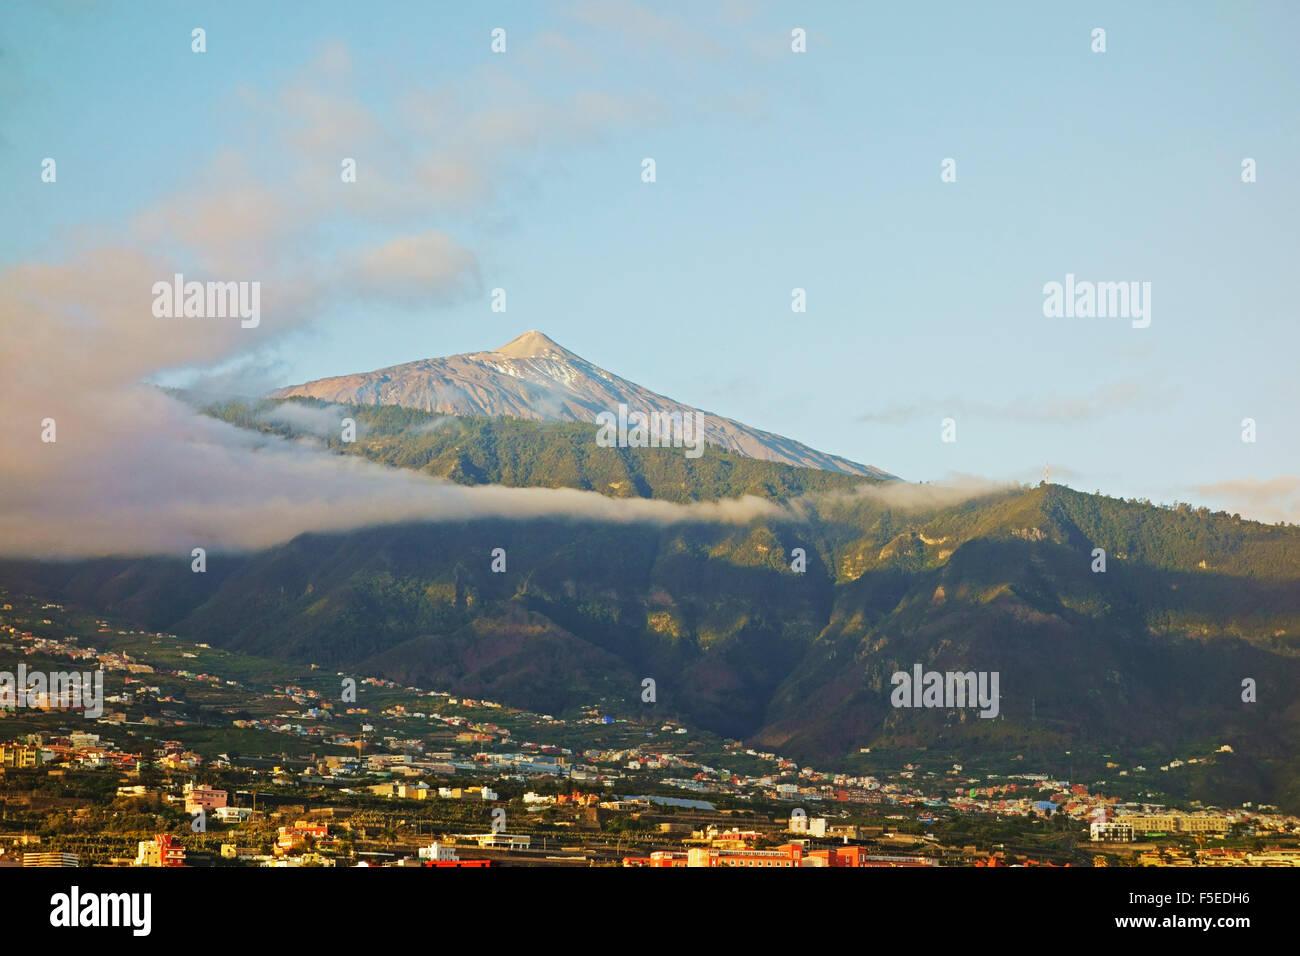 Pico del Teide und das Orotavatal, Teneriffa, Kanarische Inseln, Spanien, Atlantik, Europa Stockfoto